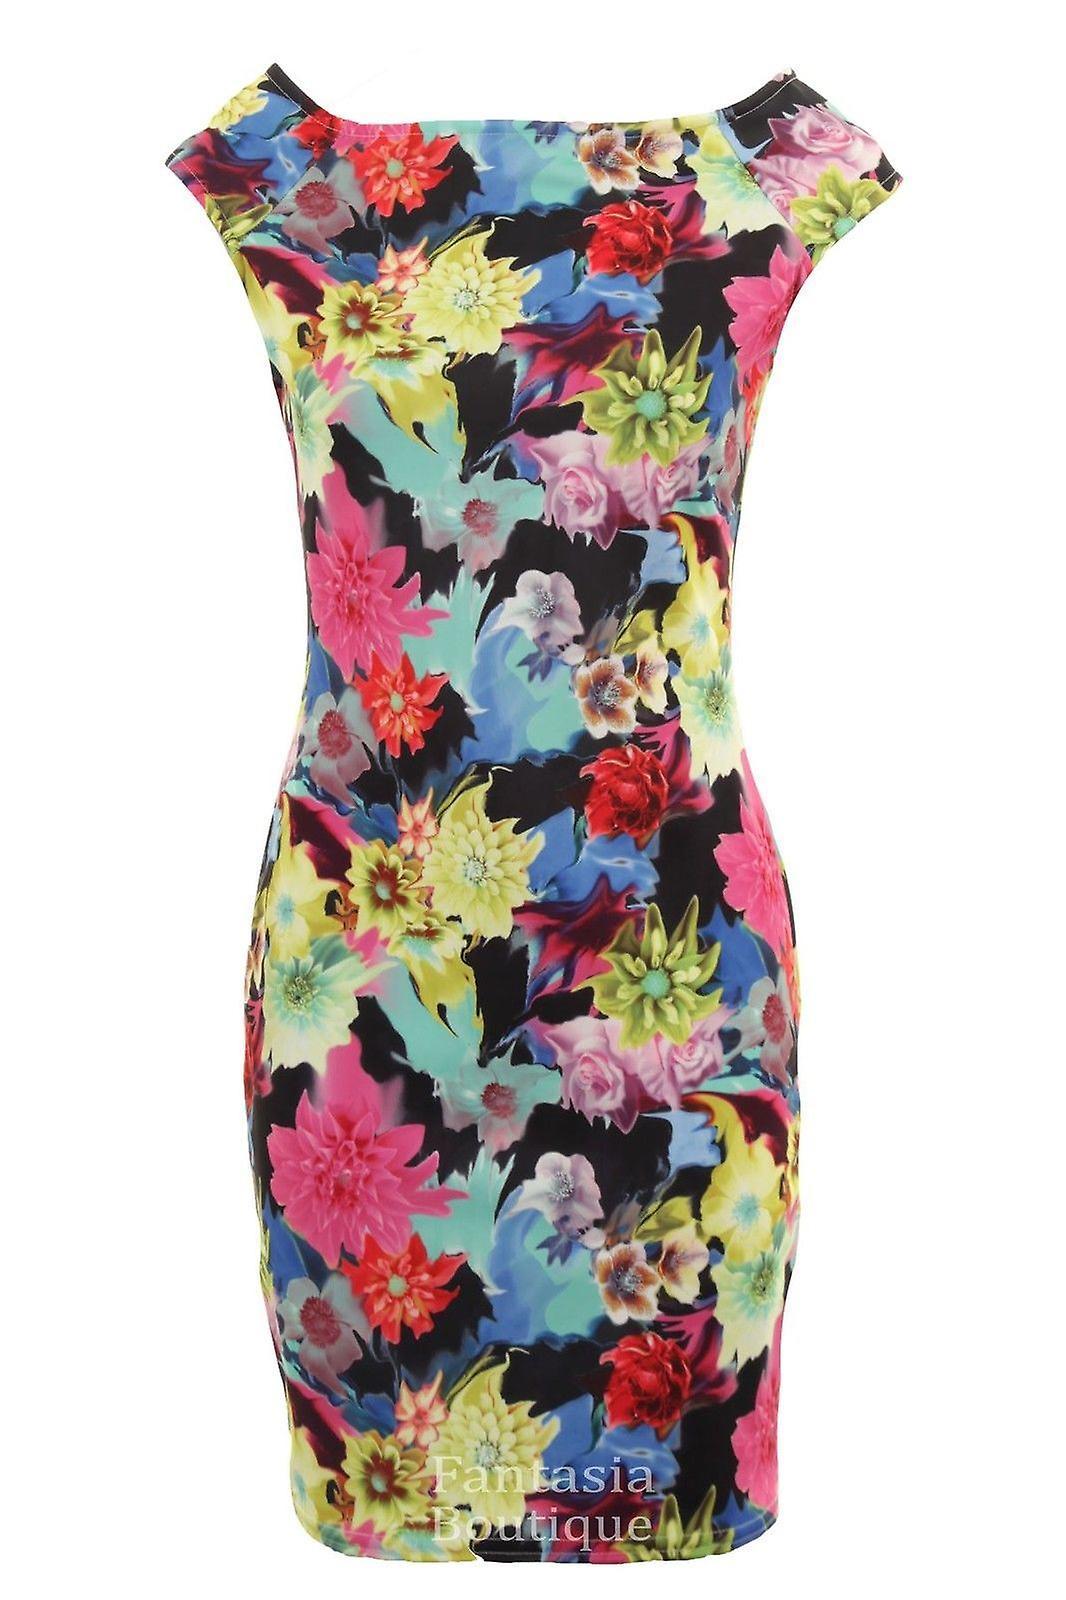 Ladies Sleeveless Multi Colour Floral Print Stretch Bodycon Women's Short Dress